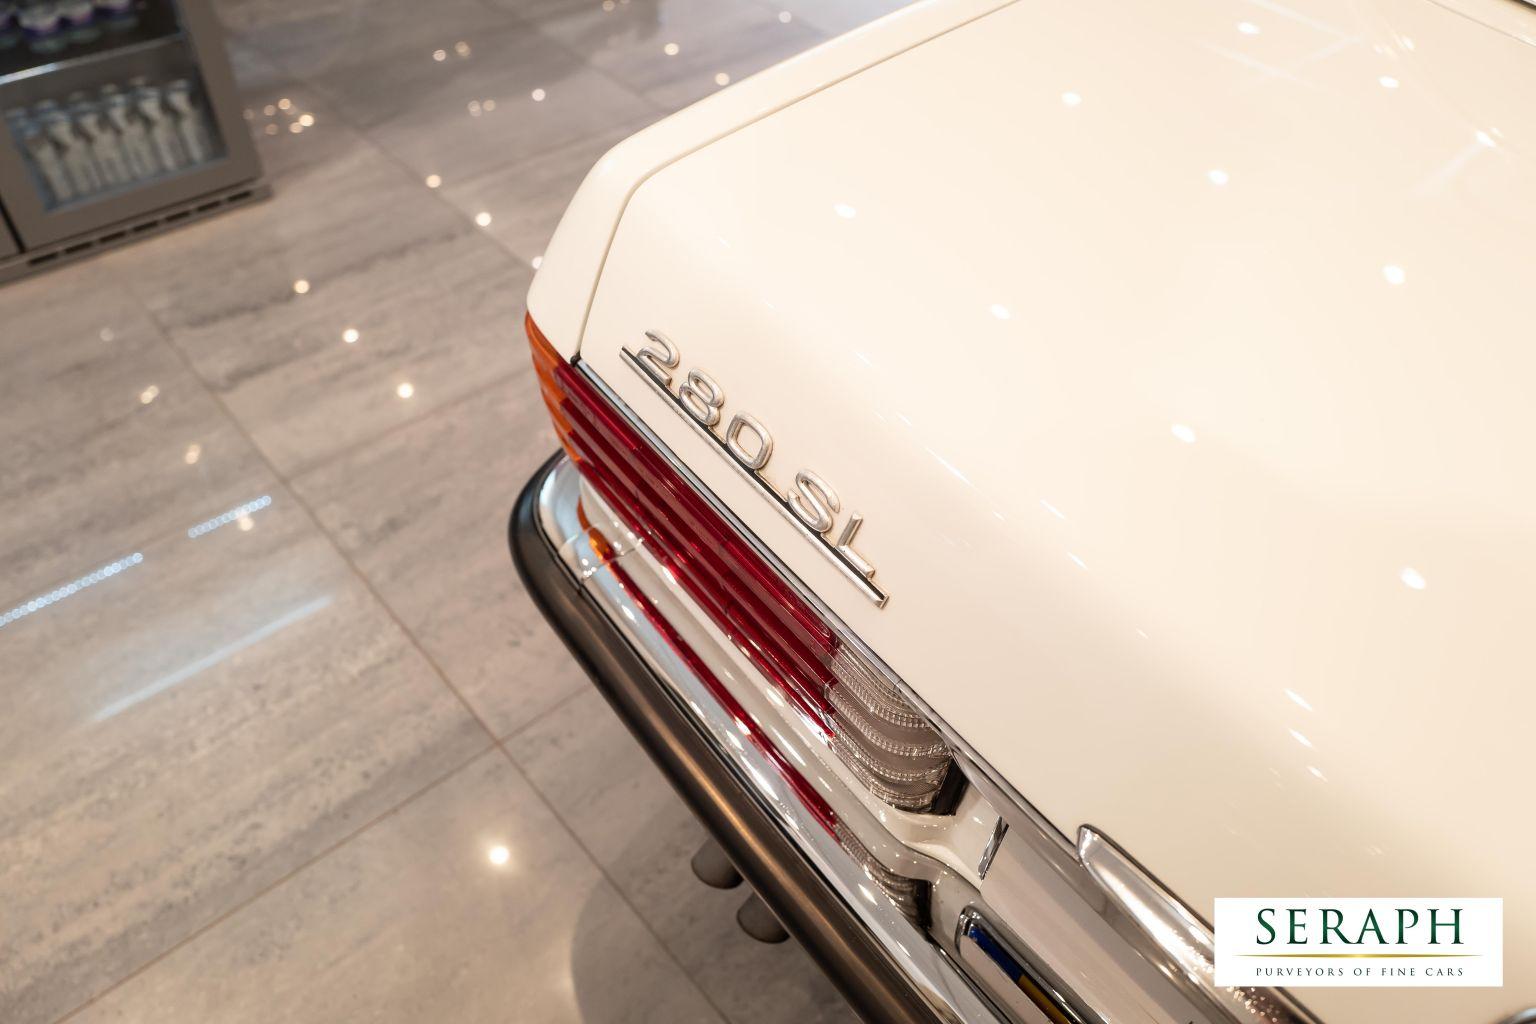 1984 Mercedes 280 SL